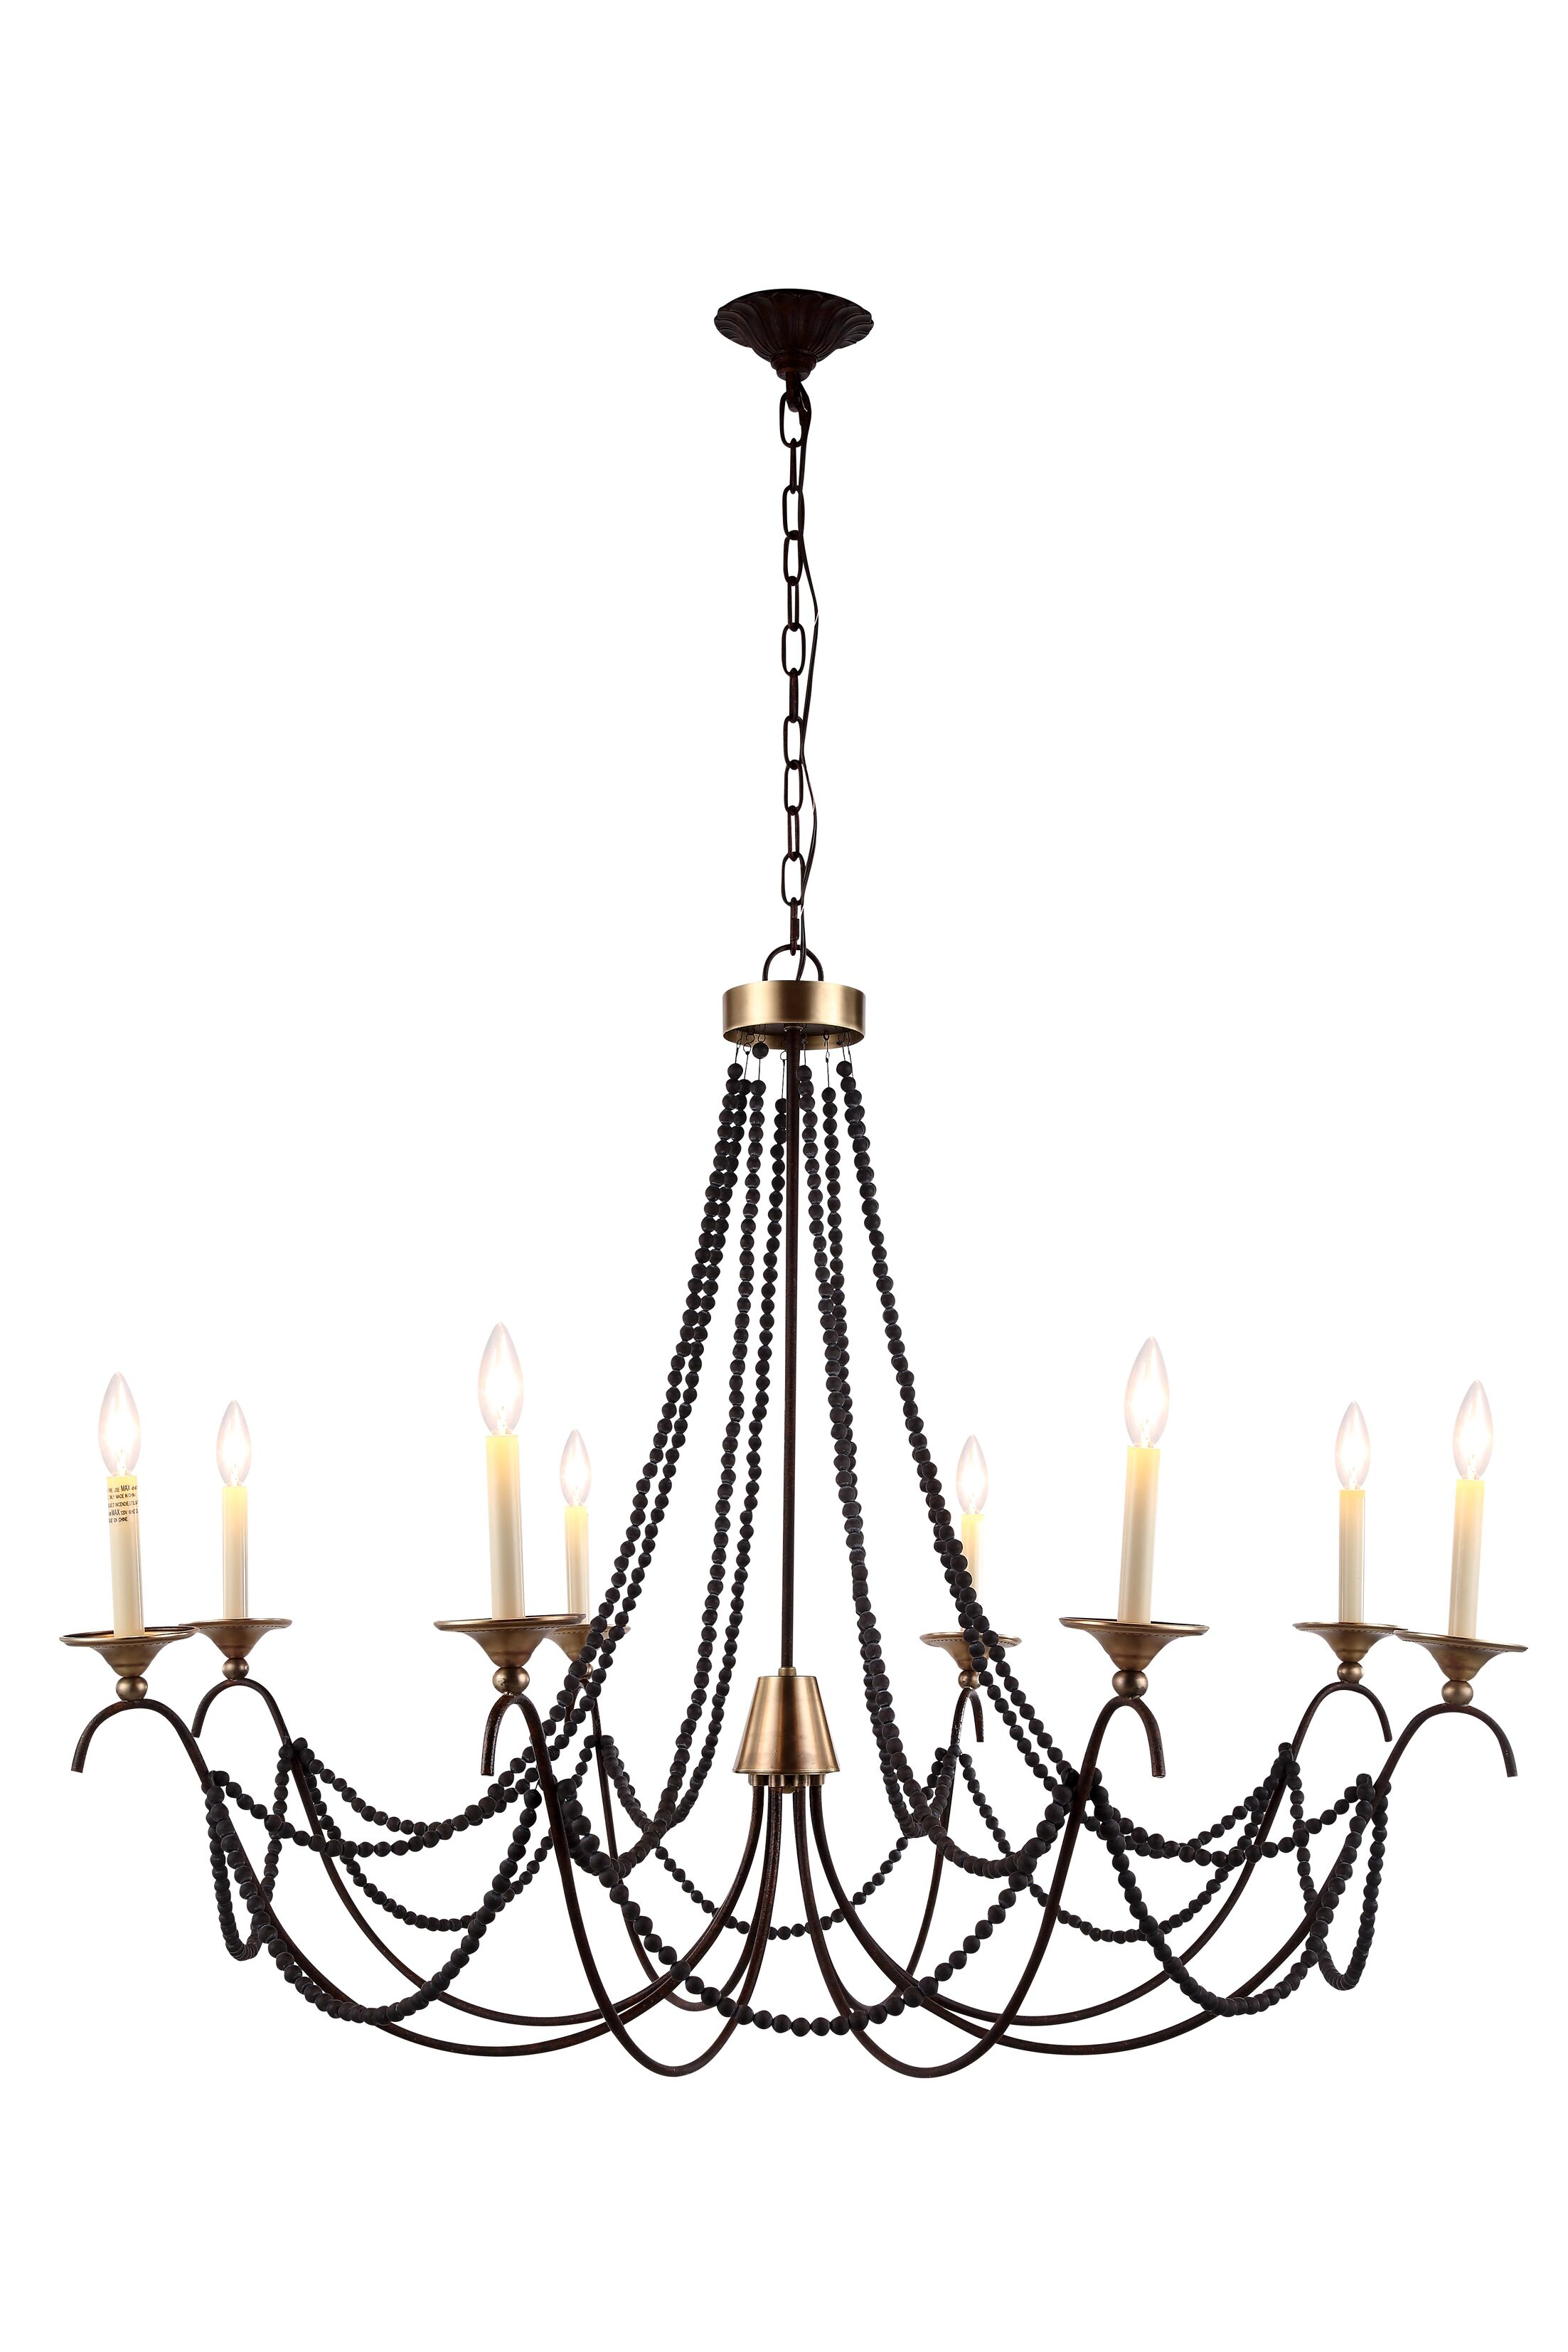 Georgia 6 Light Cangle-Style Chandelier Size: 8 Light